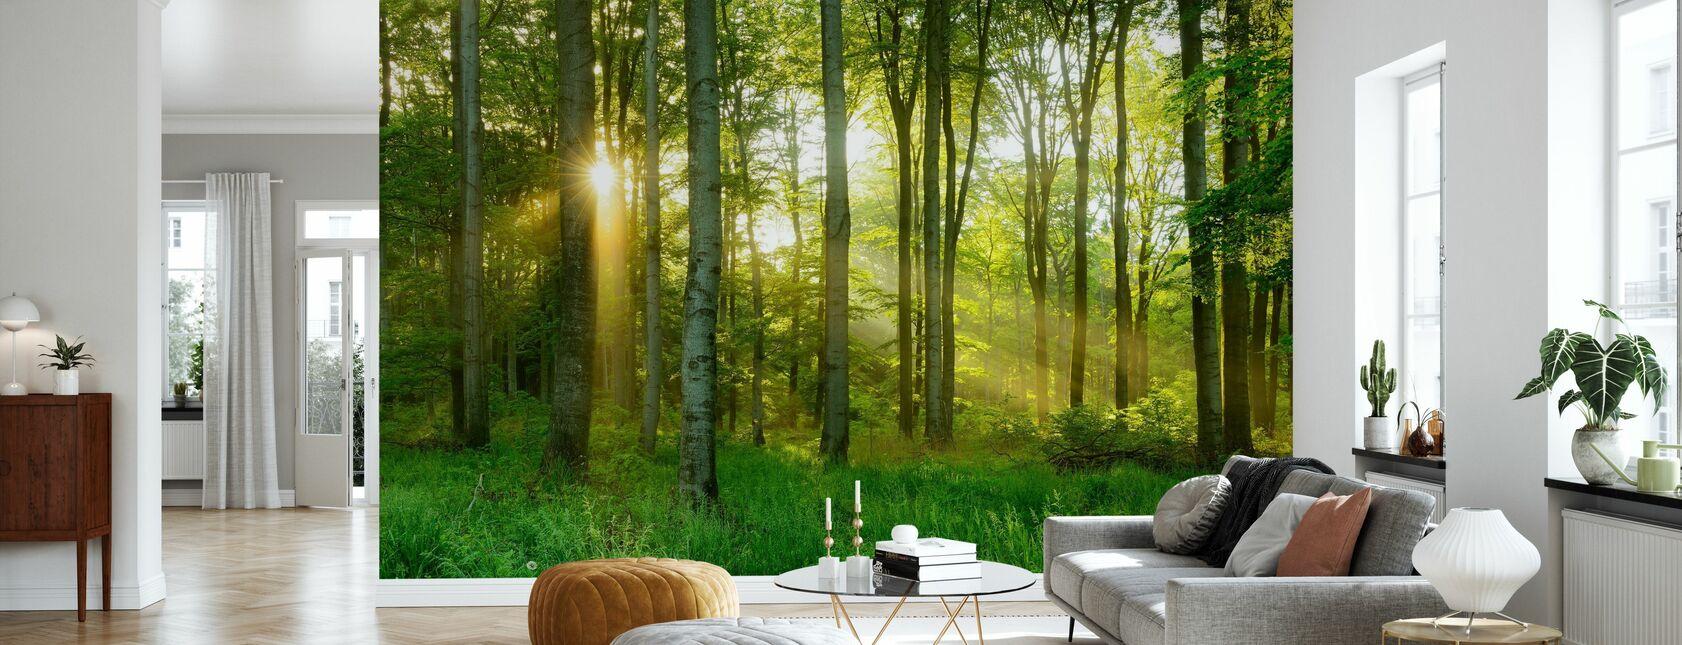 Beech Tree Forest - Wallpaper - Living Room